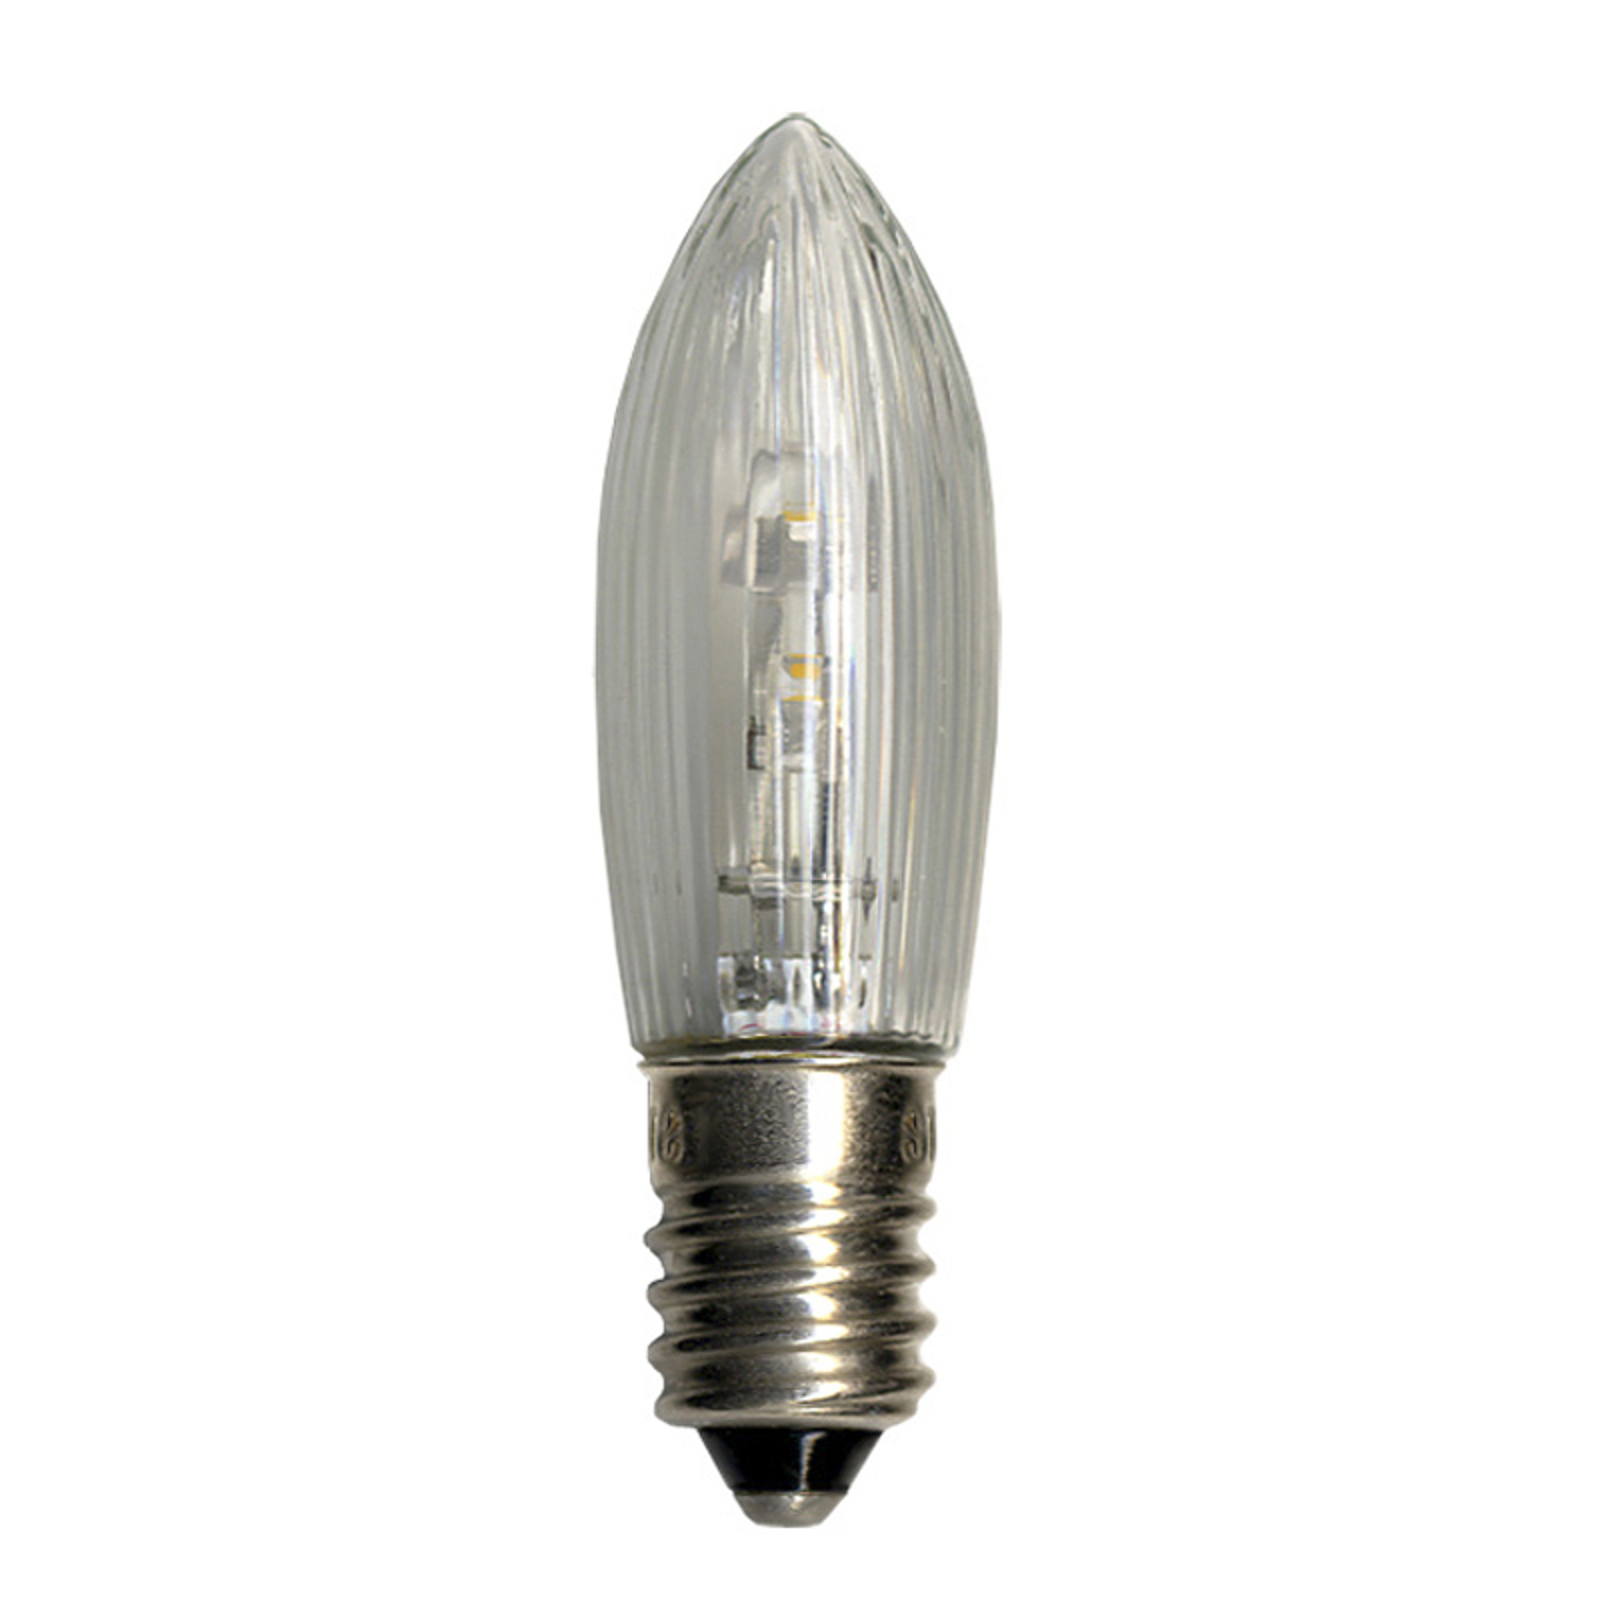 E10 0.1W 10-55V LED bulb pack of 3, candle shape_1522312_1